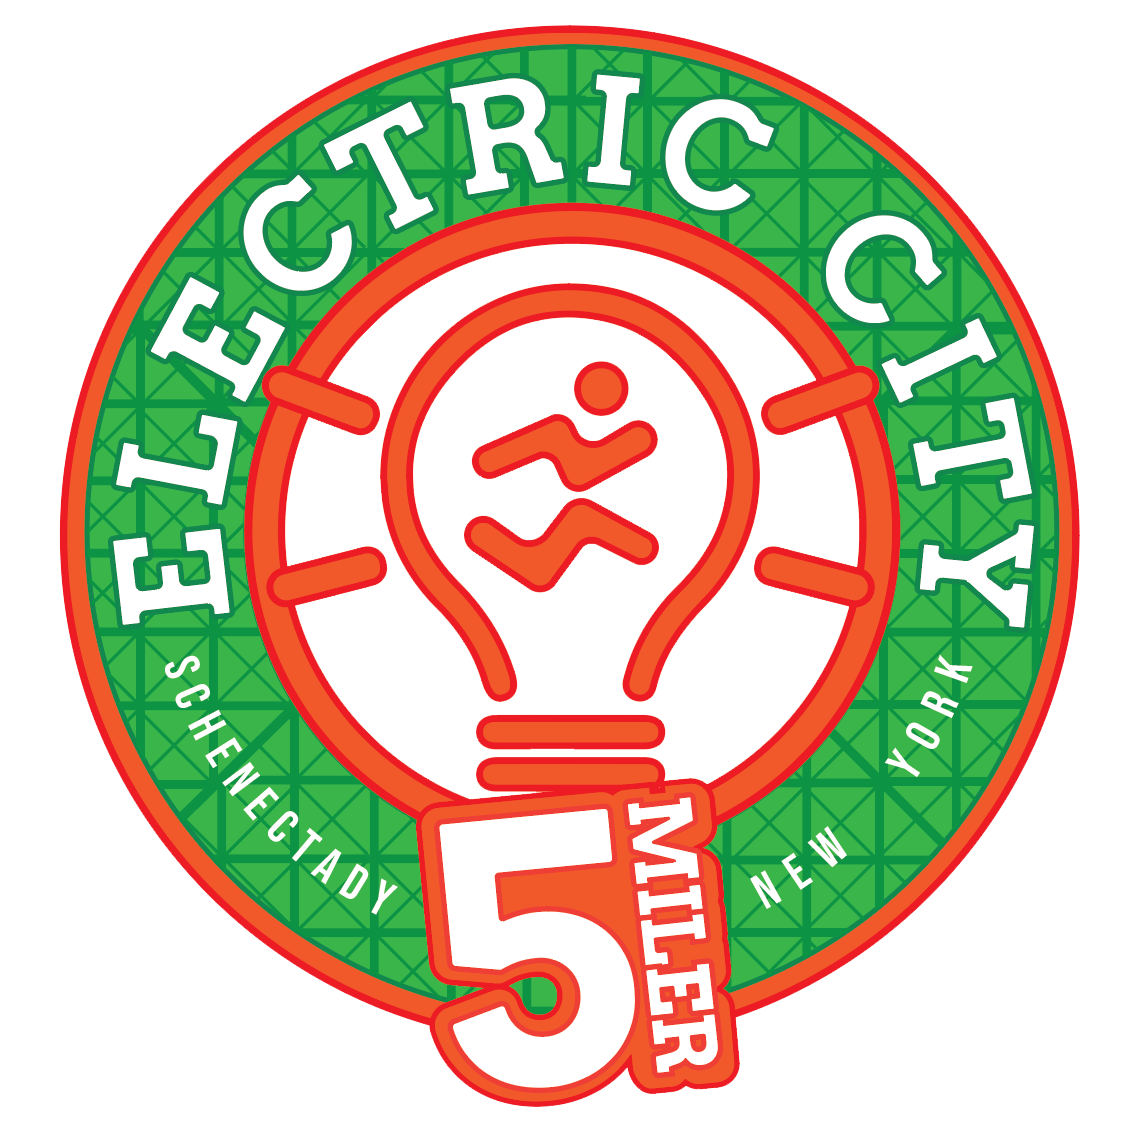 Image result for electric city 5 miler